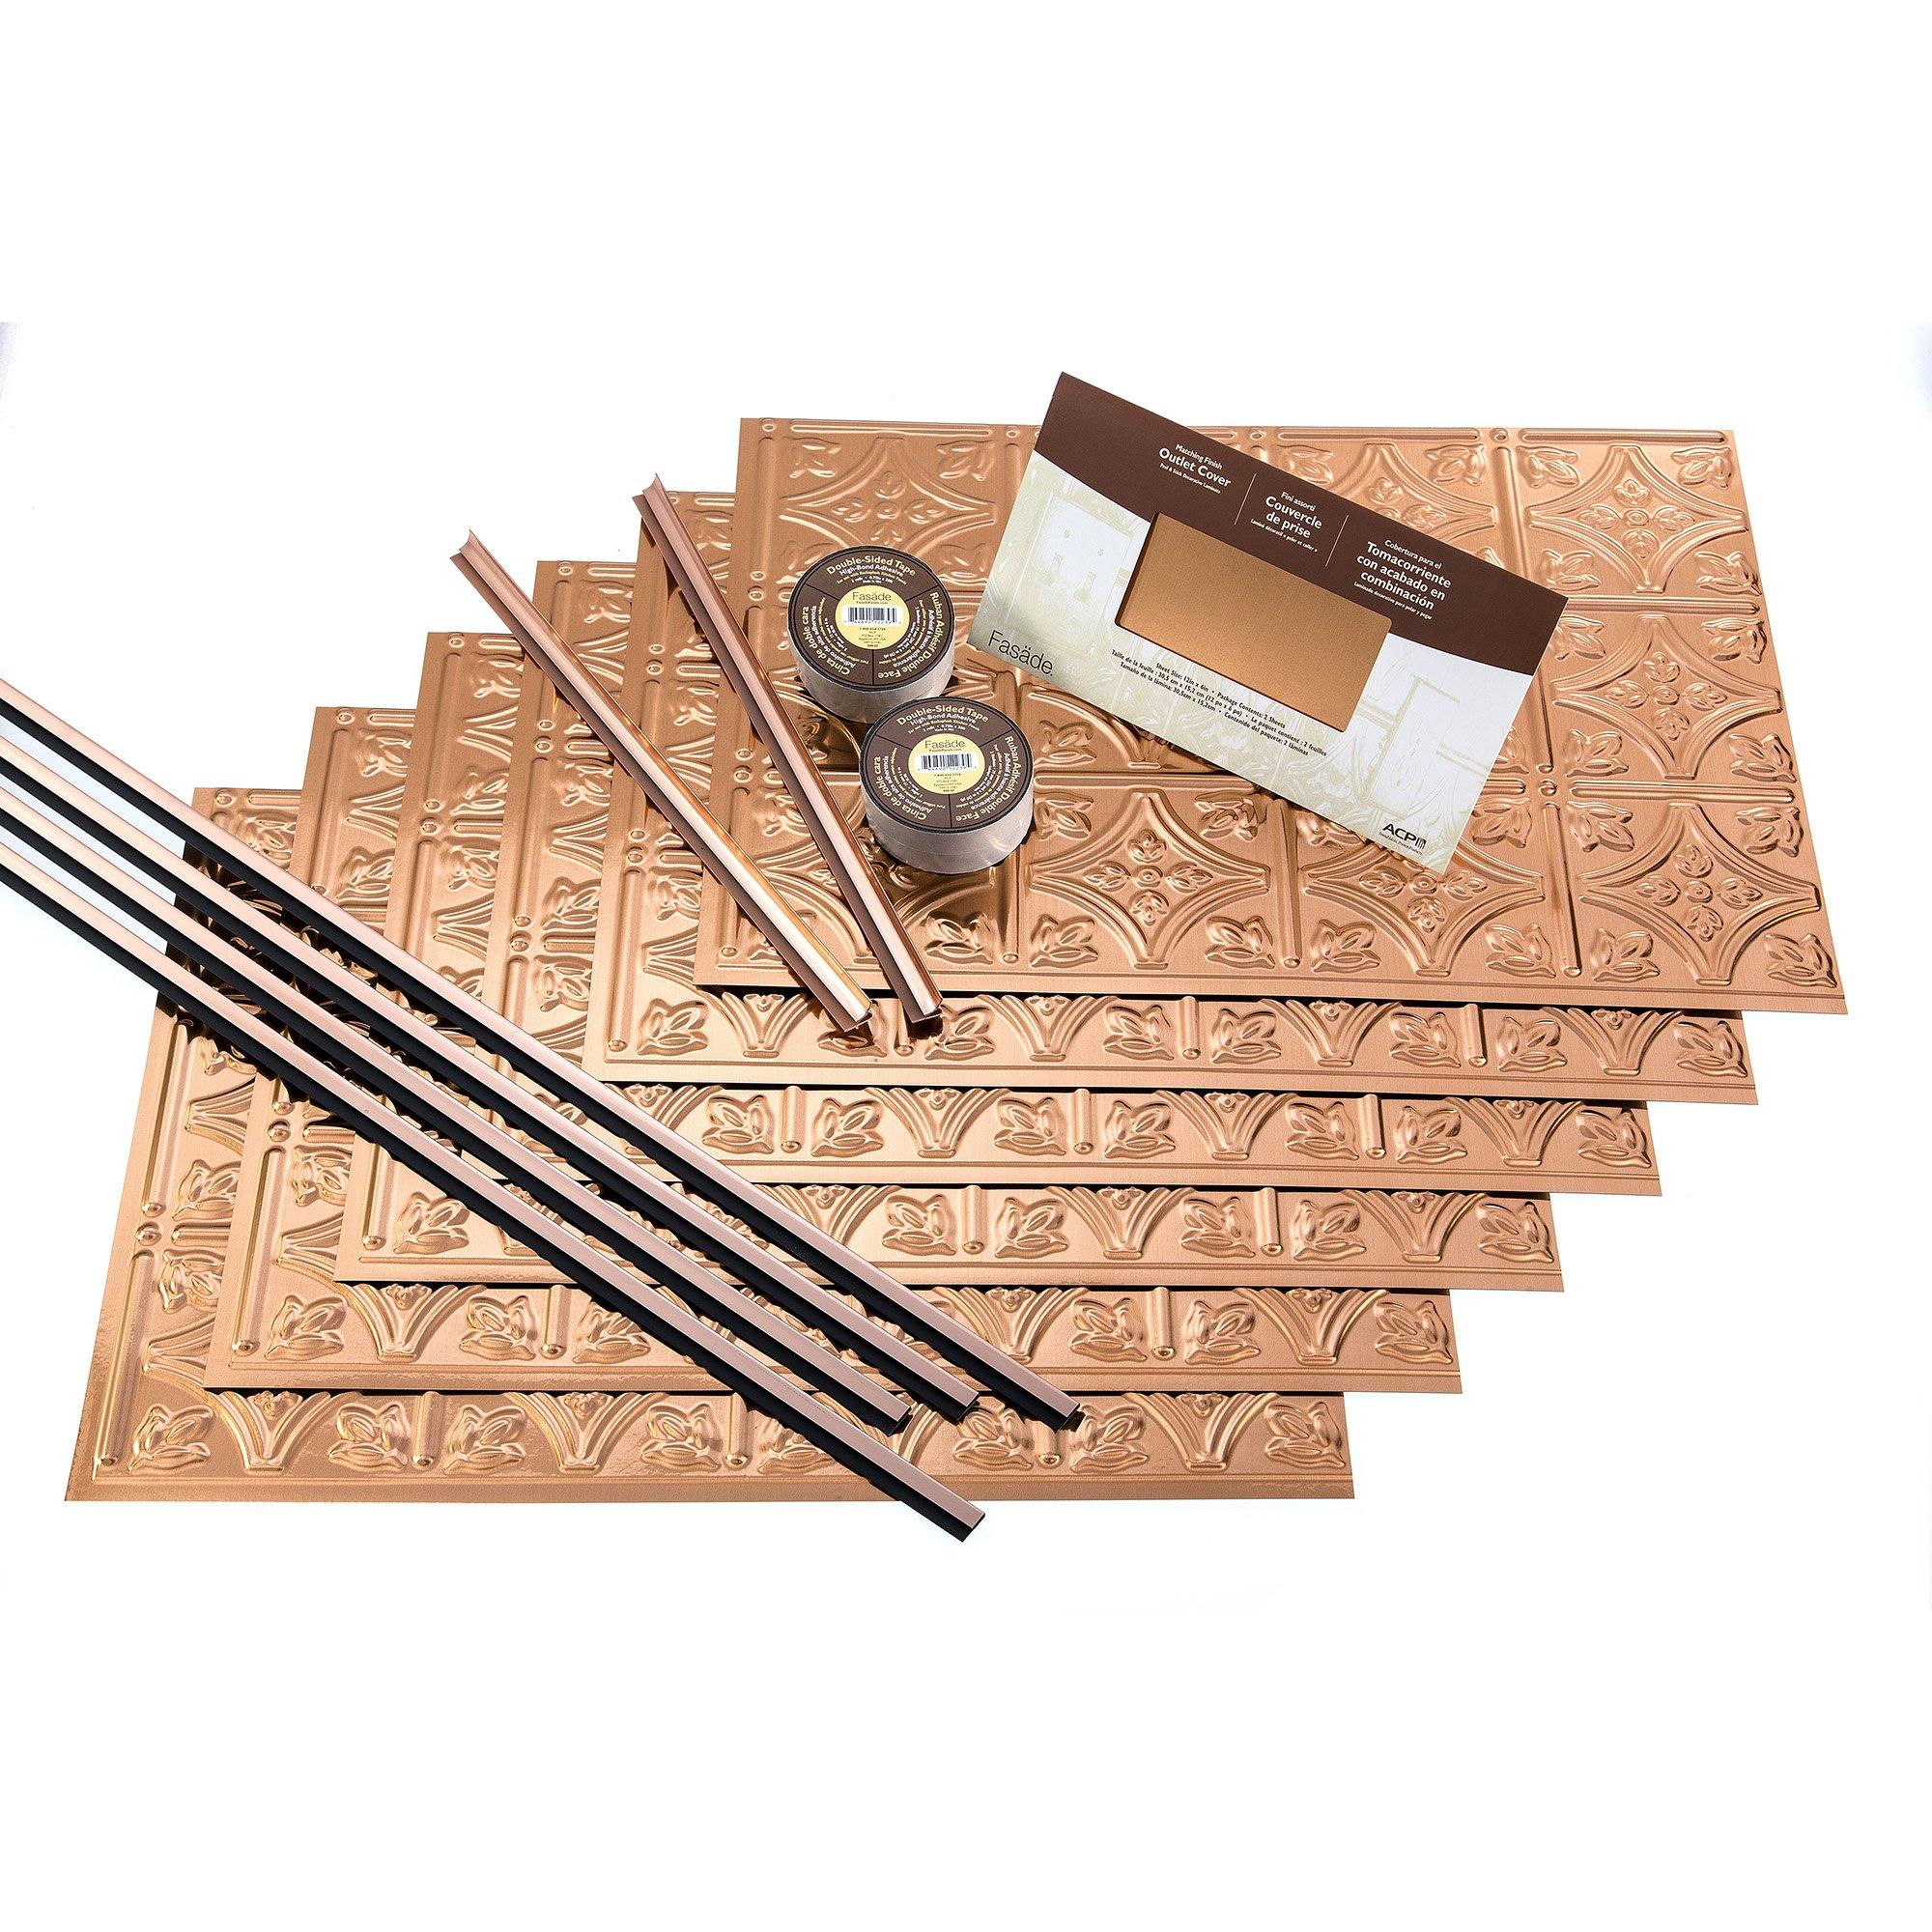 FASÄDE Easy Installation Traditional 1 Polished Copper Backsplash Panel for Kitchen and Bathrooms (18 sq ft Kit)